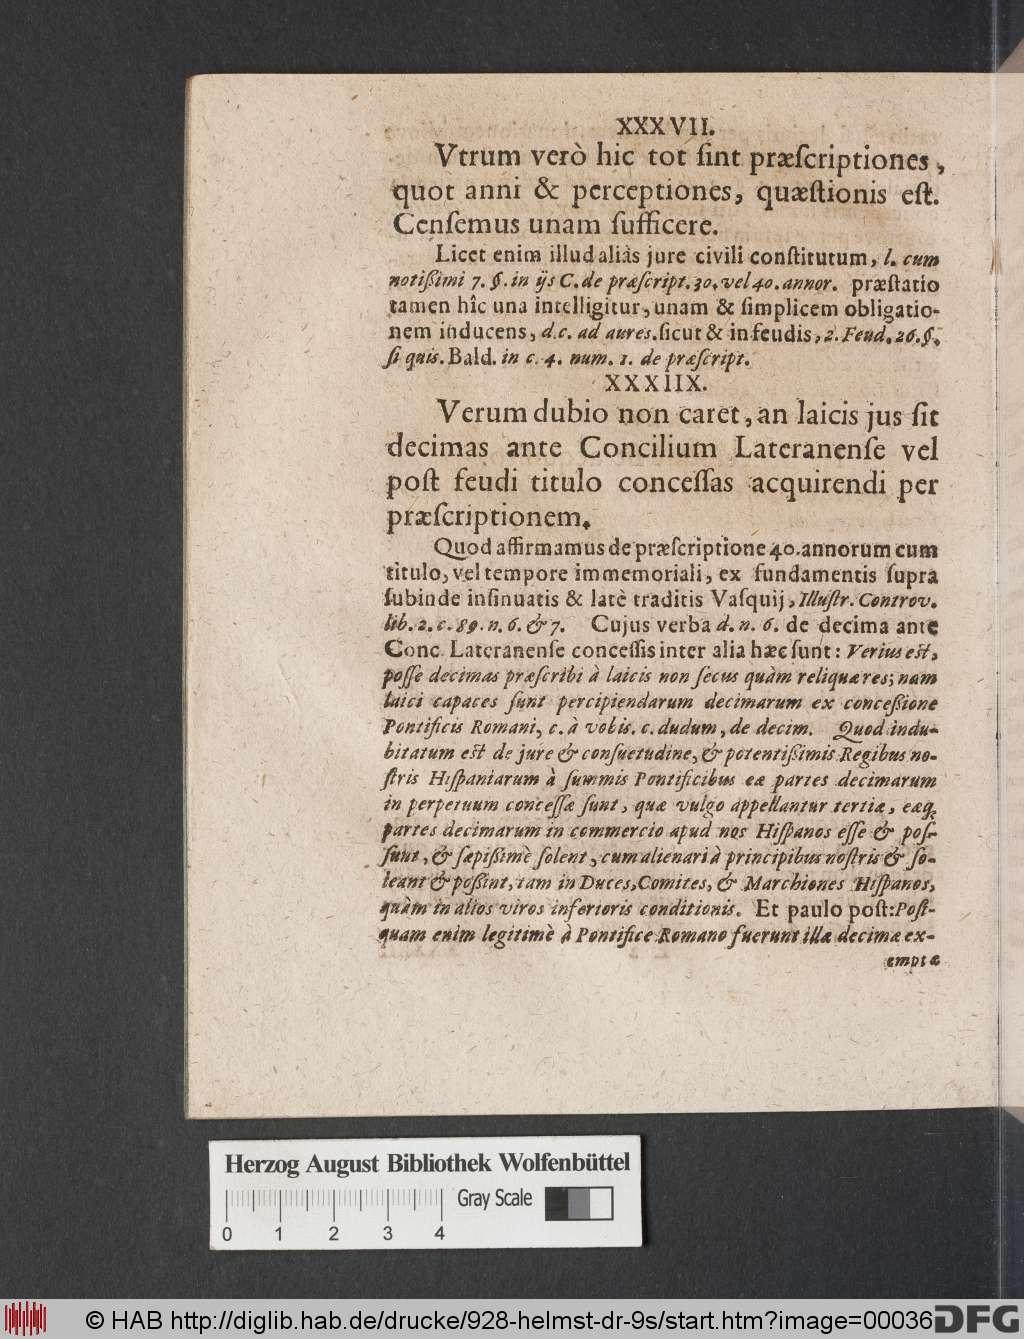 http://diglib.hab.de/drucke/928-helmst-dr-9s/00036.jpg